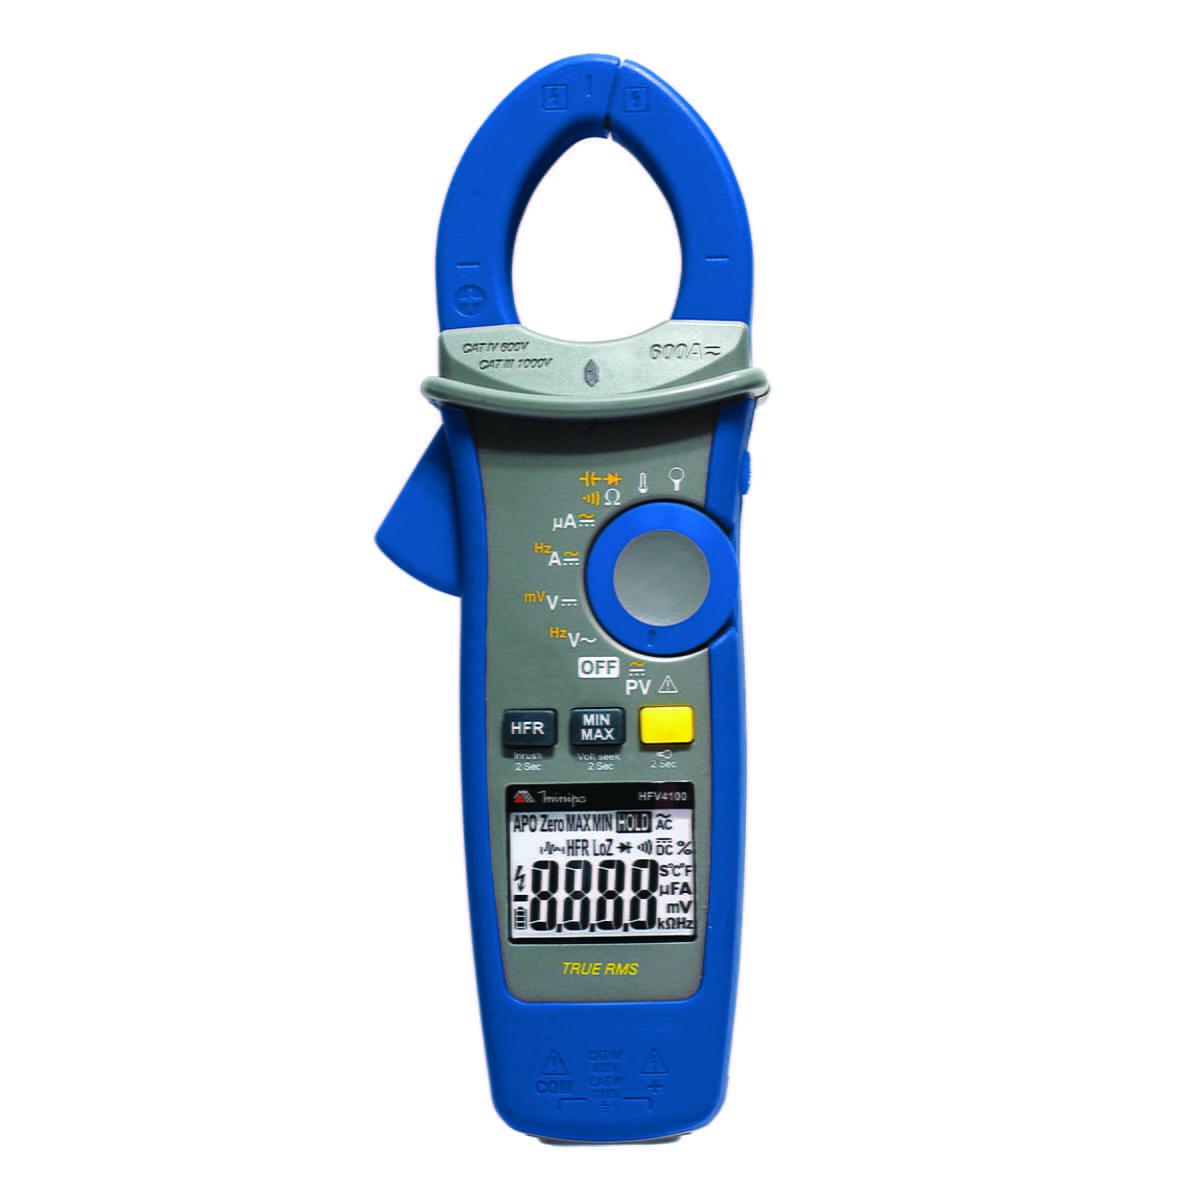 Alicate Amperimetro Digital para Painel Solar 1500V AC HFV4100 - MINIPA